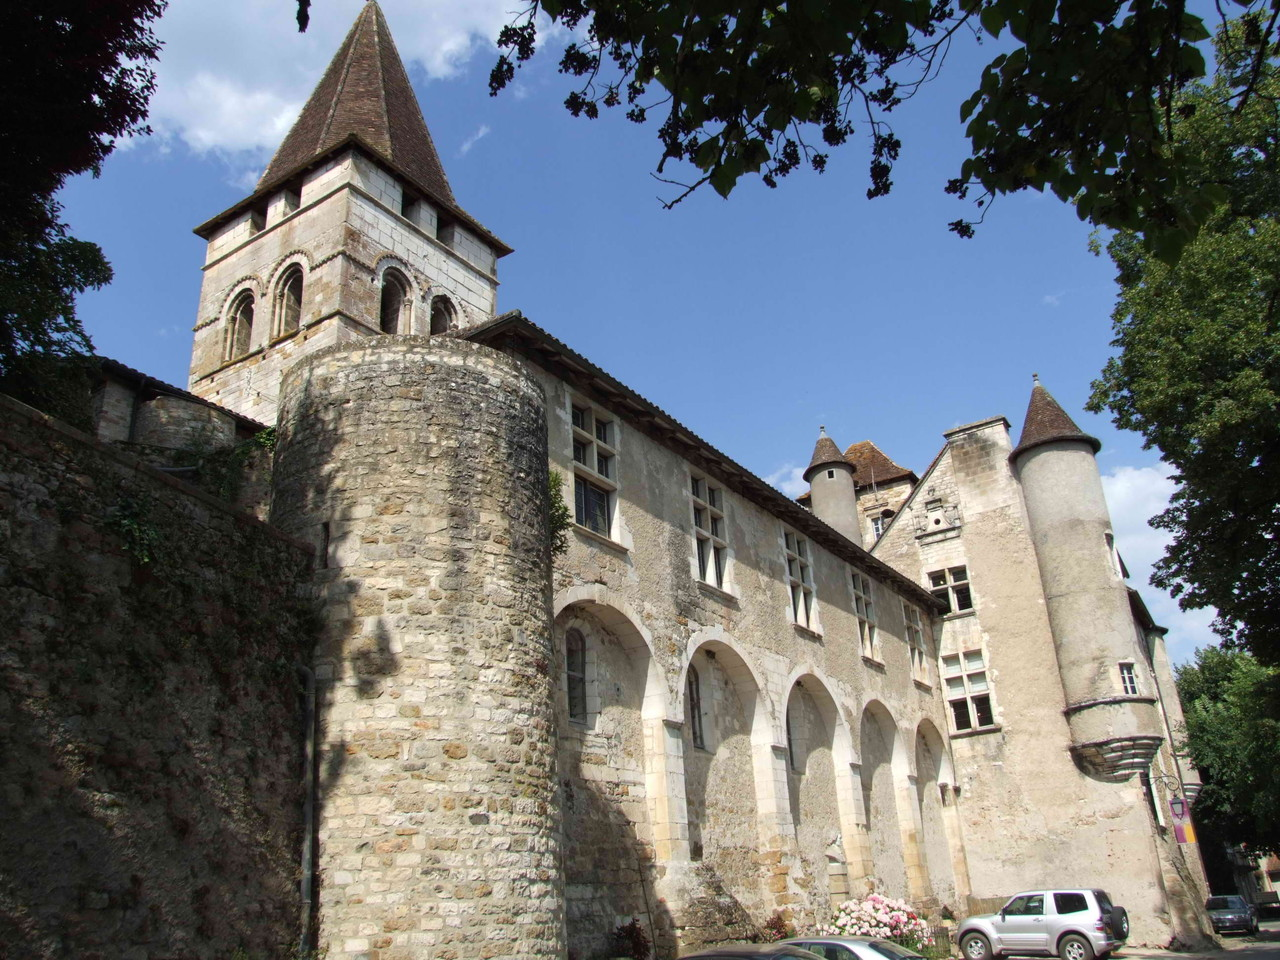 Le château de Carennac